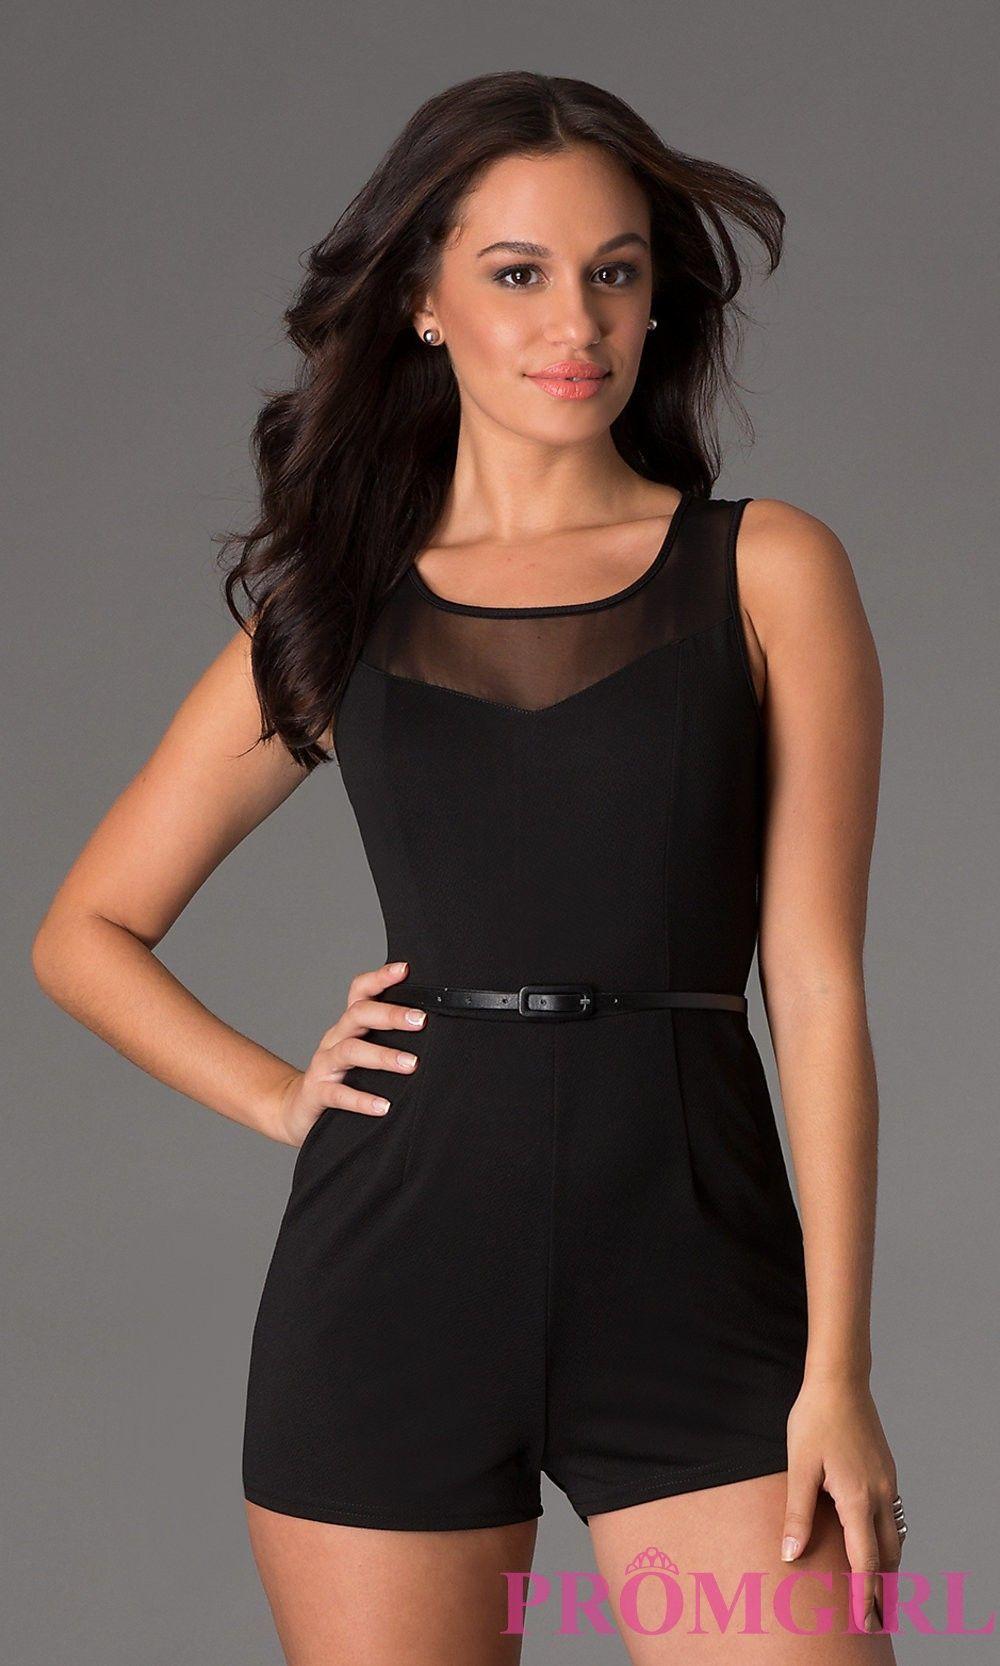 Short sleeveless romper holiday dresses fashionista